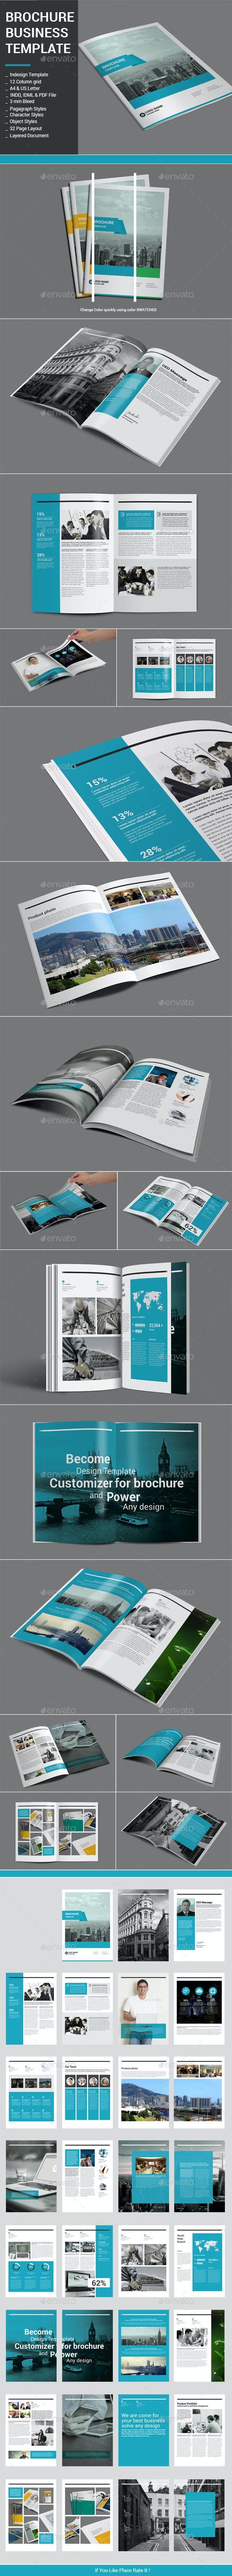 Brochure Business Template - Corporate Brochures